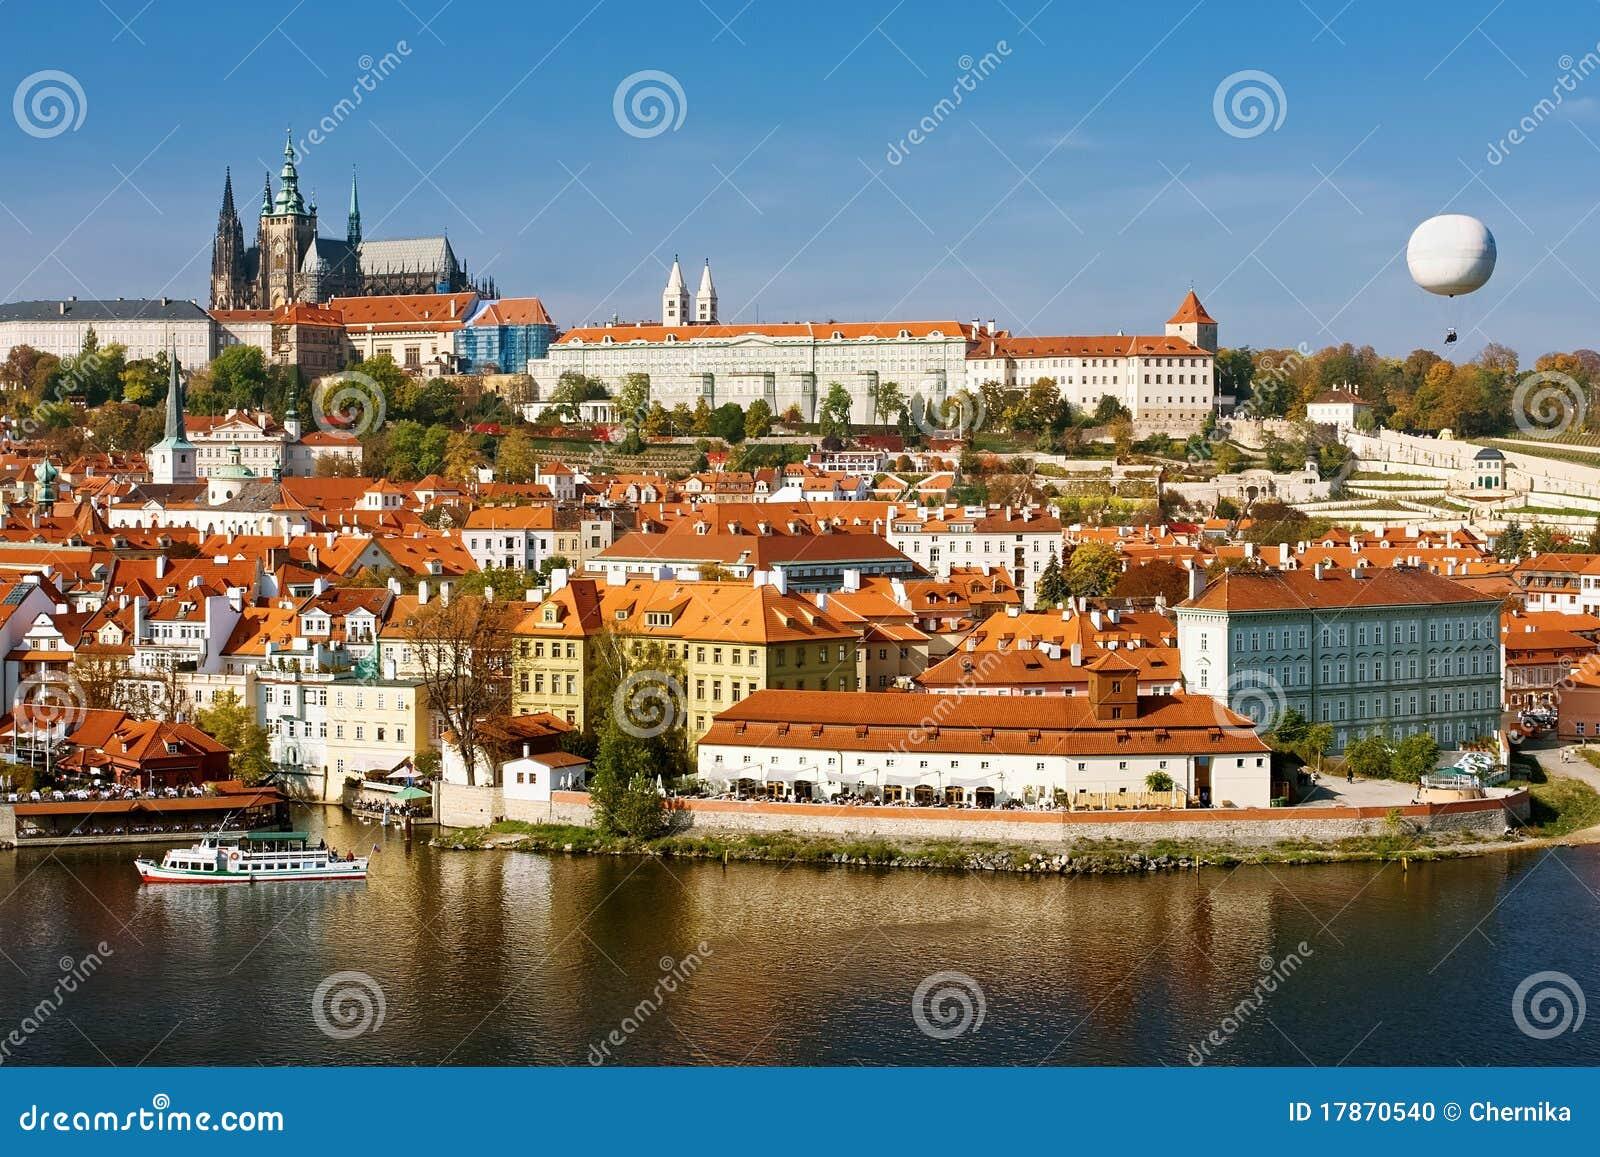 Day Prague